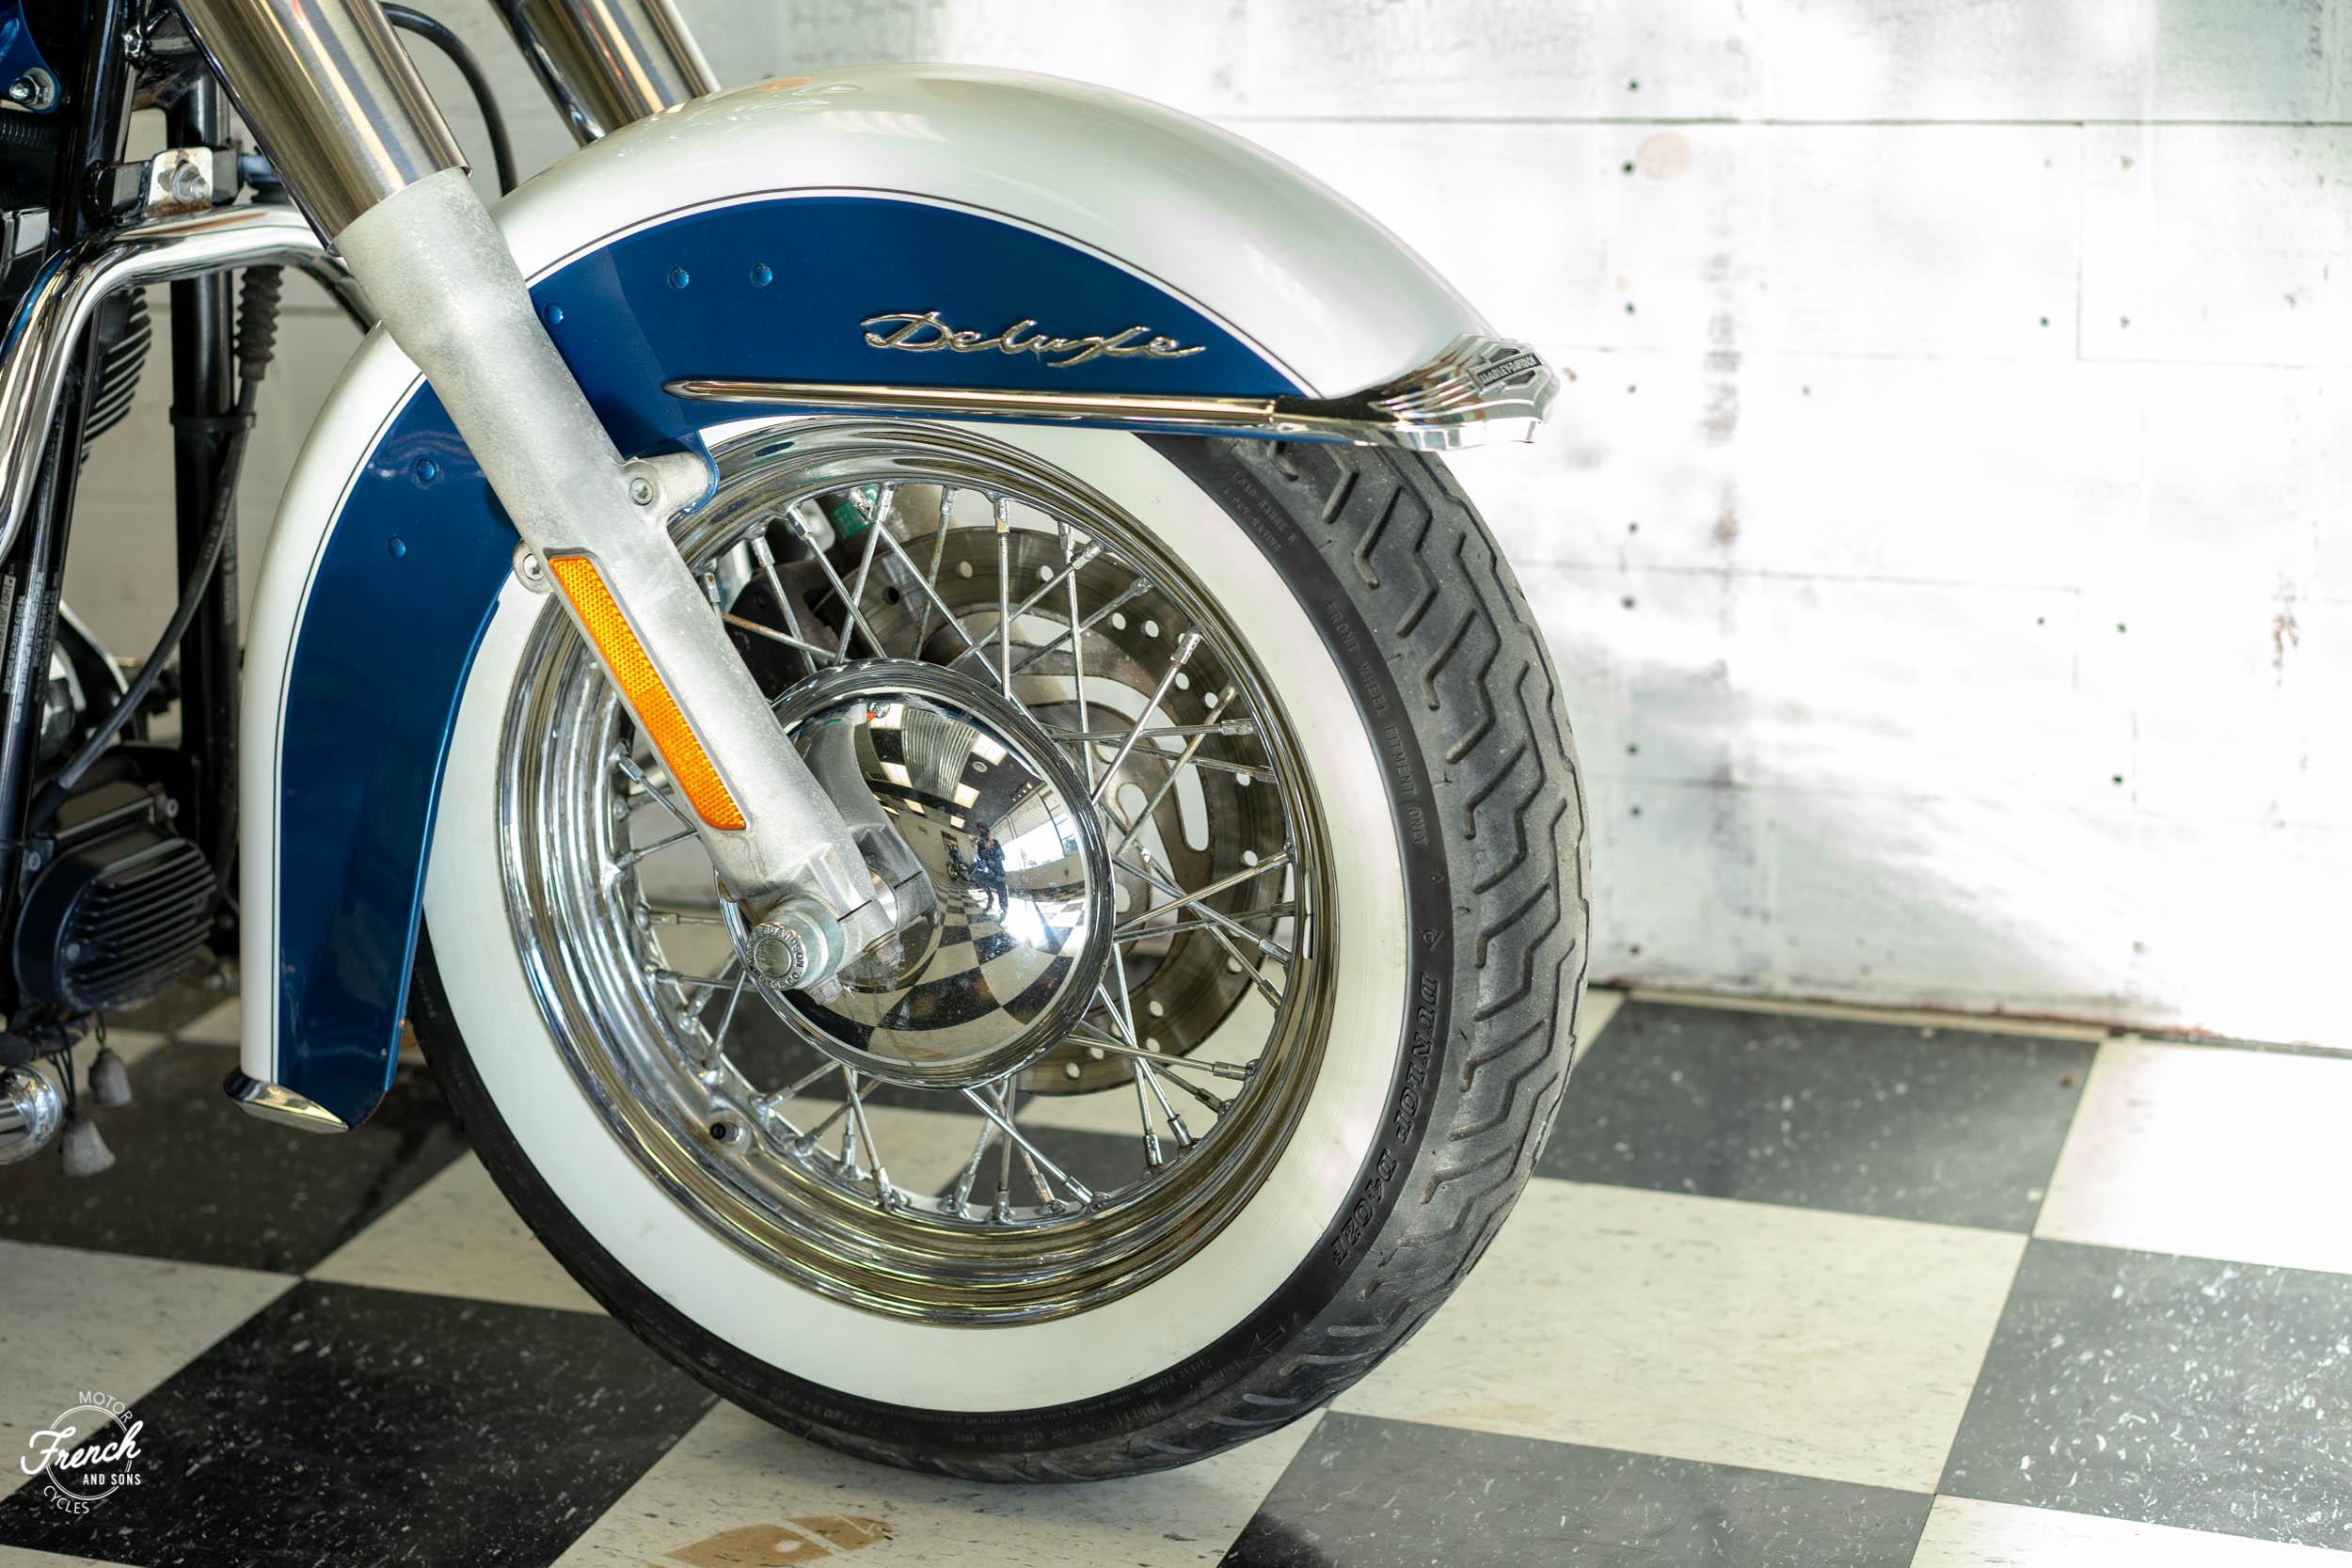 2005_Harley_Davidson_Softail_Deluxe-13.jpg